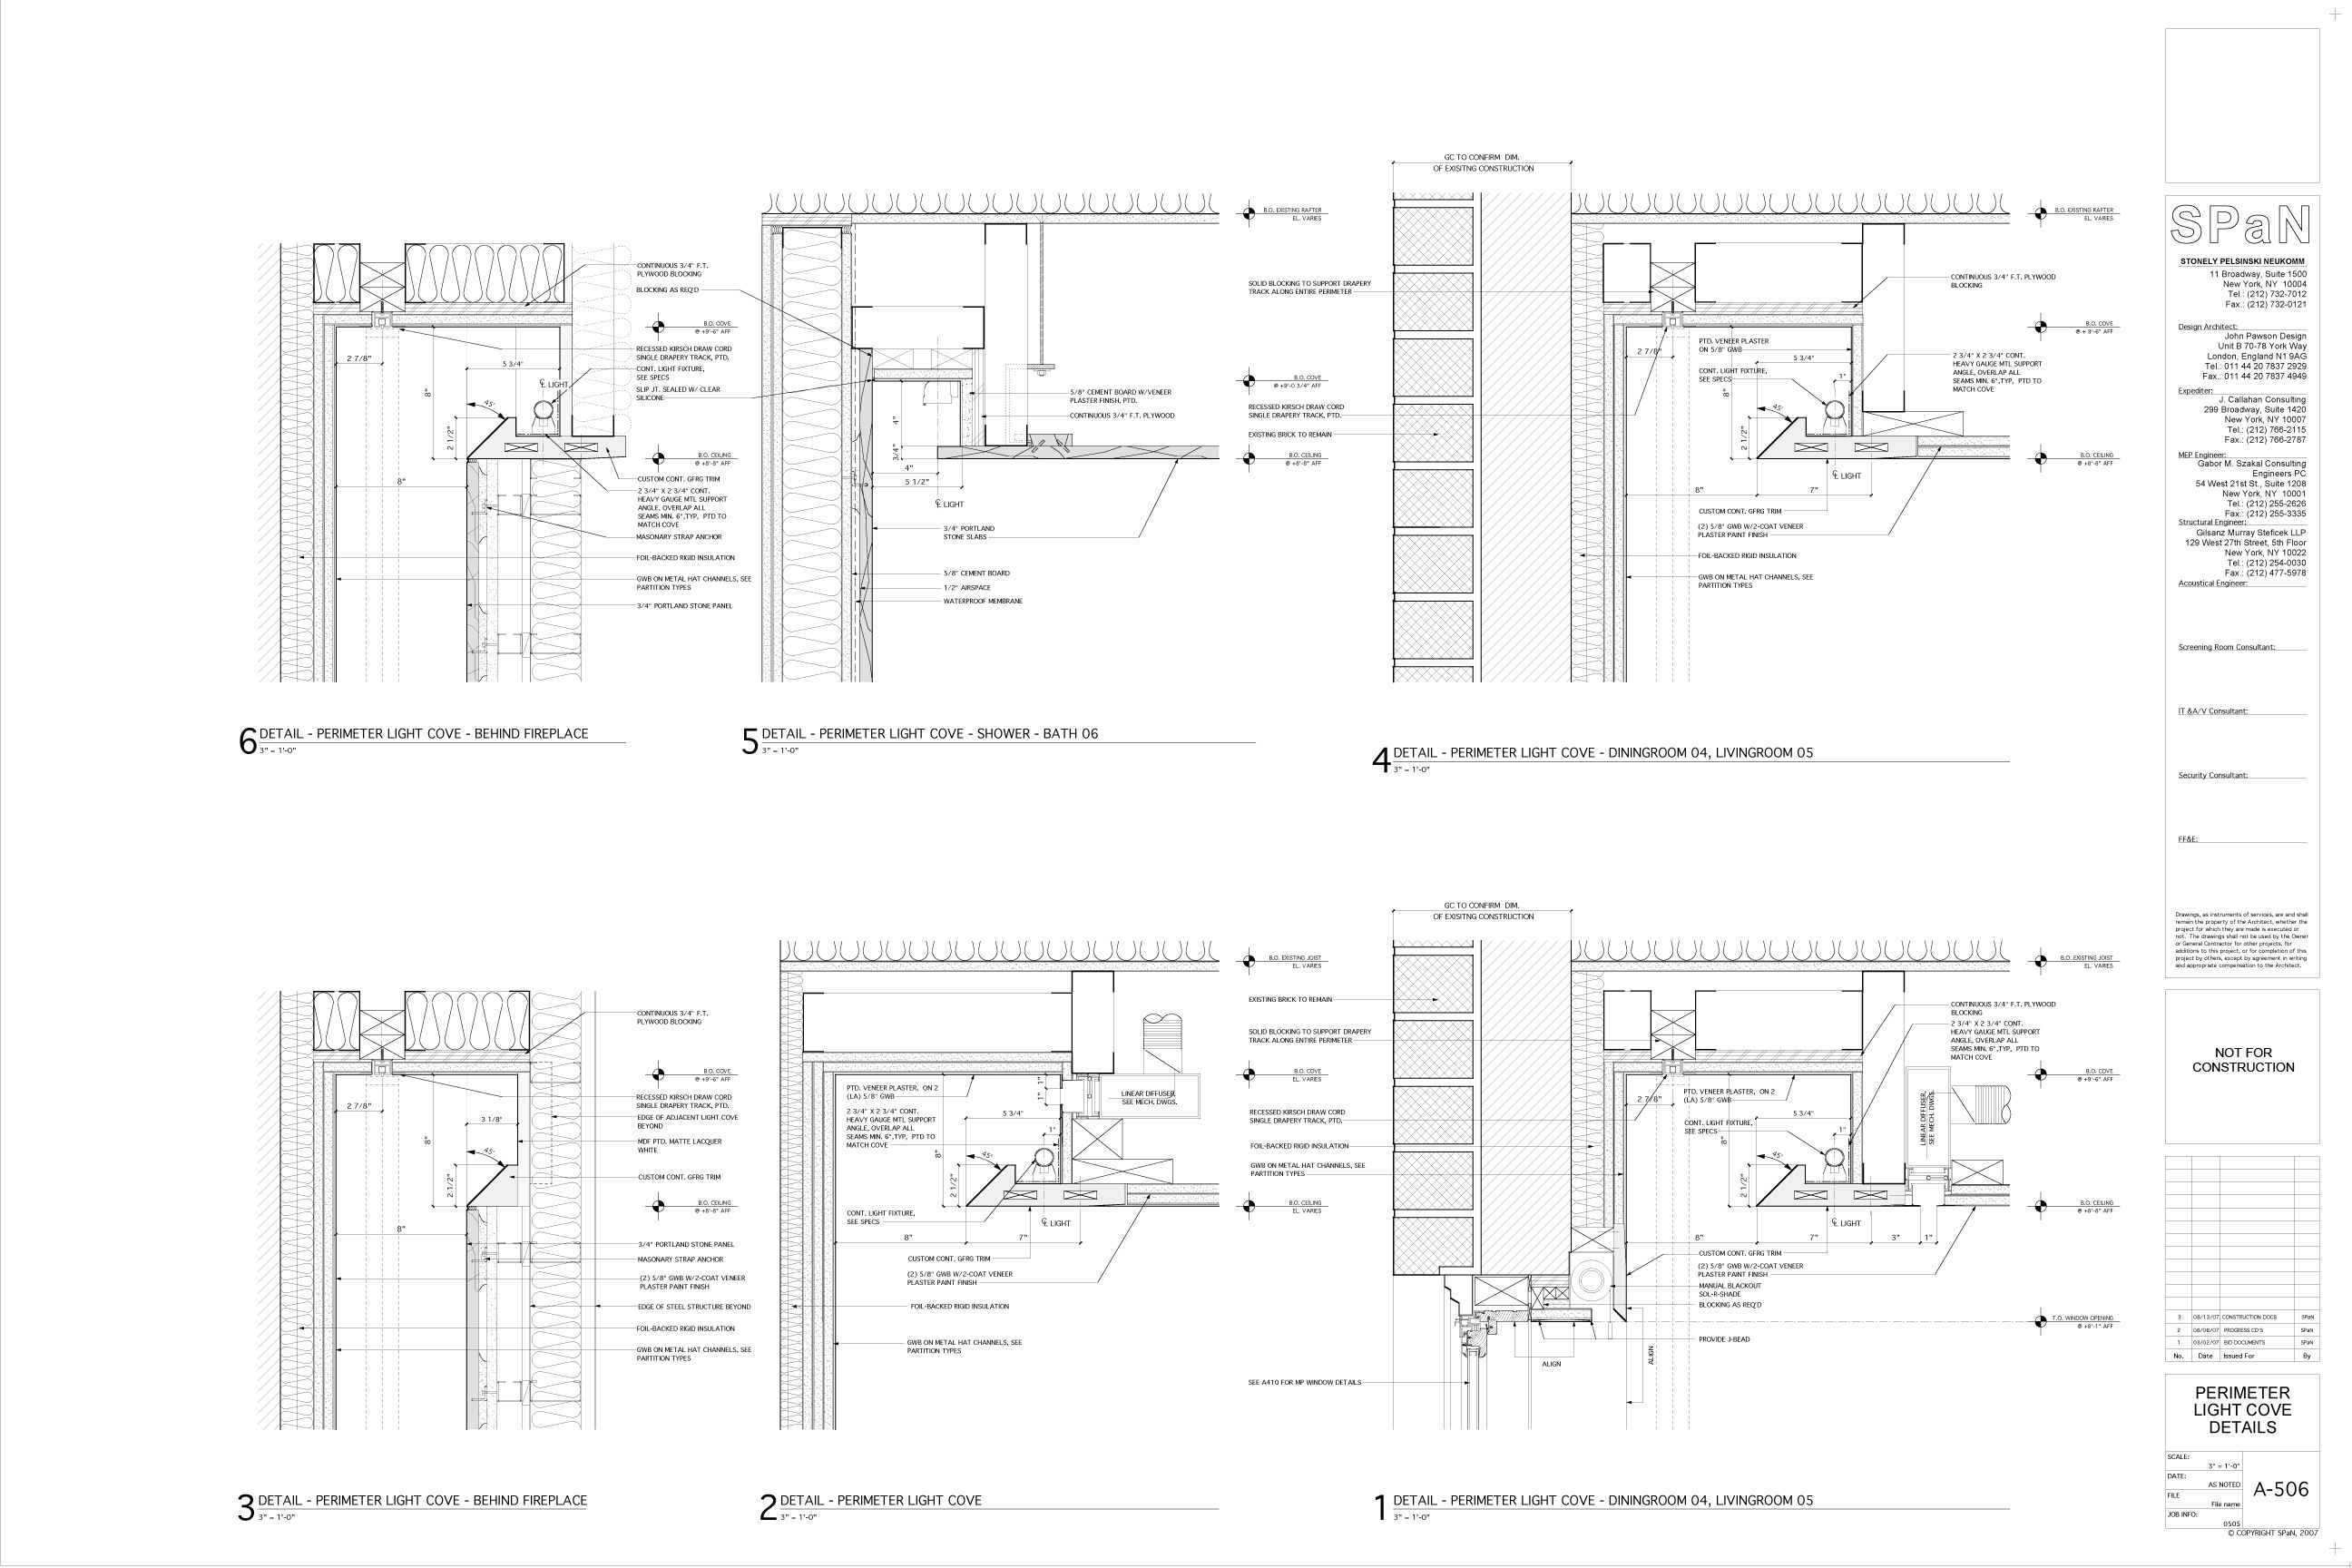 Design Architect John Pawson Architect Of Record Span